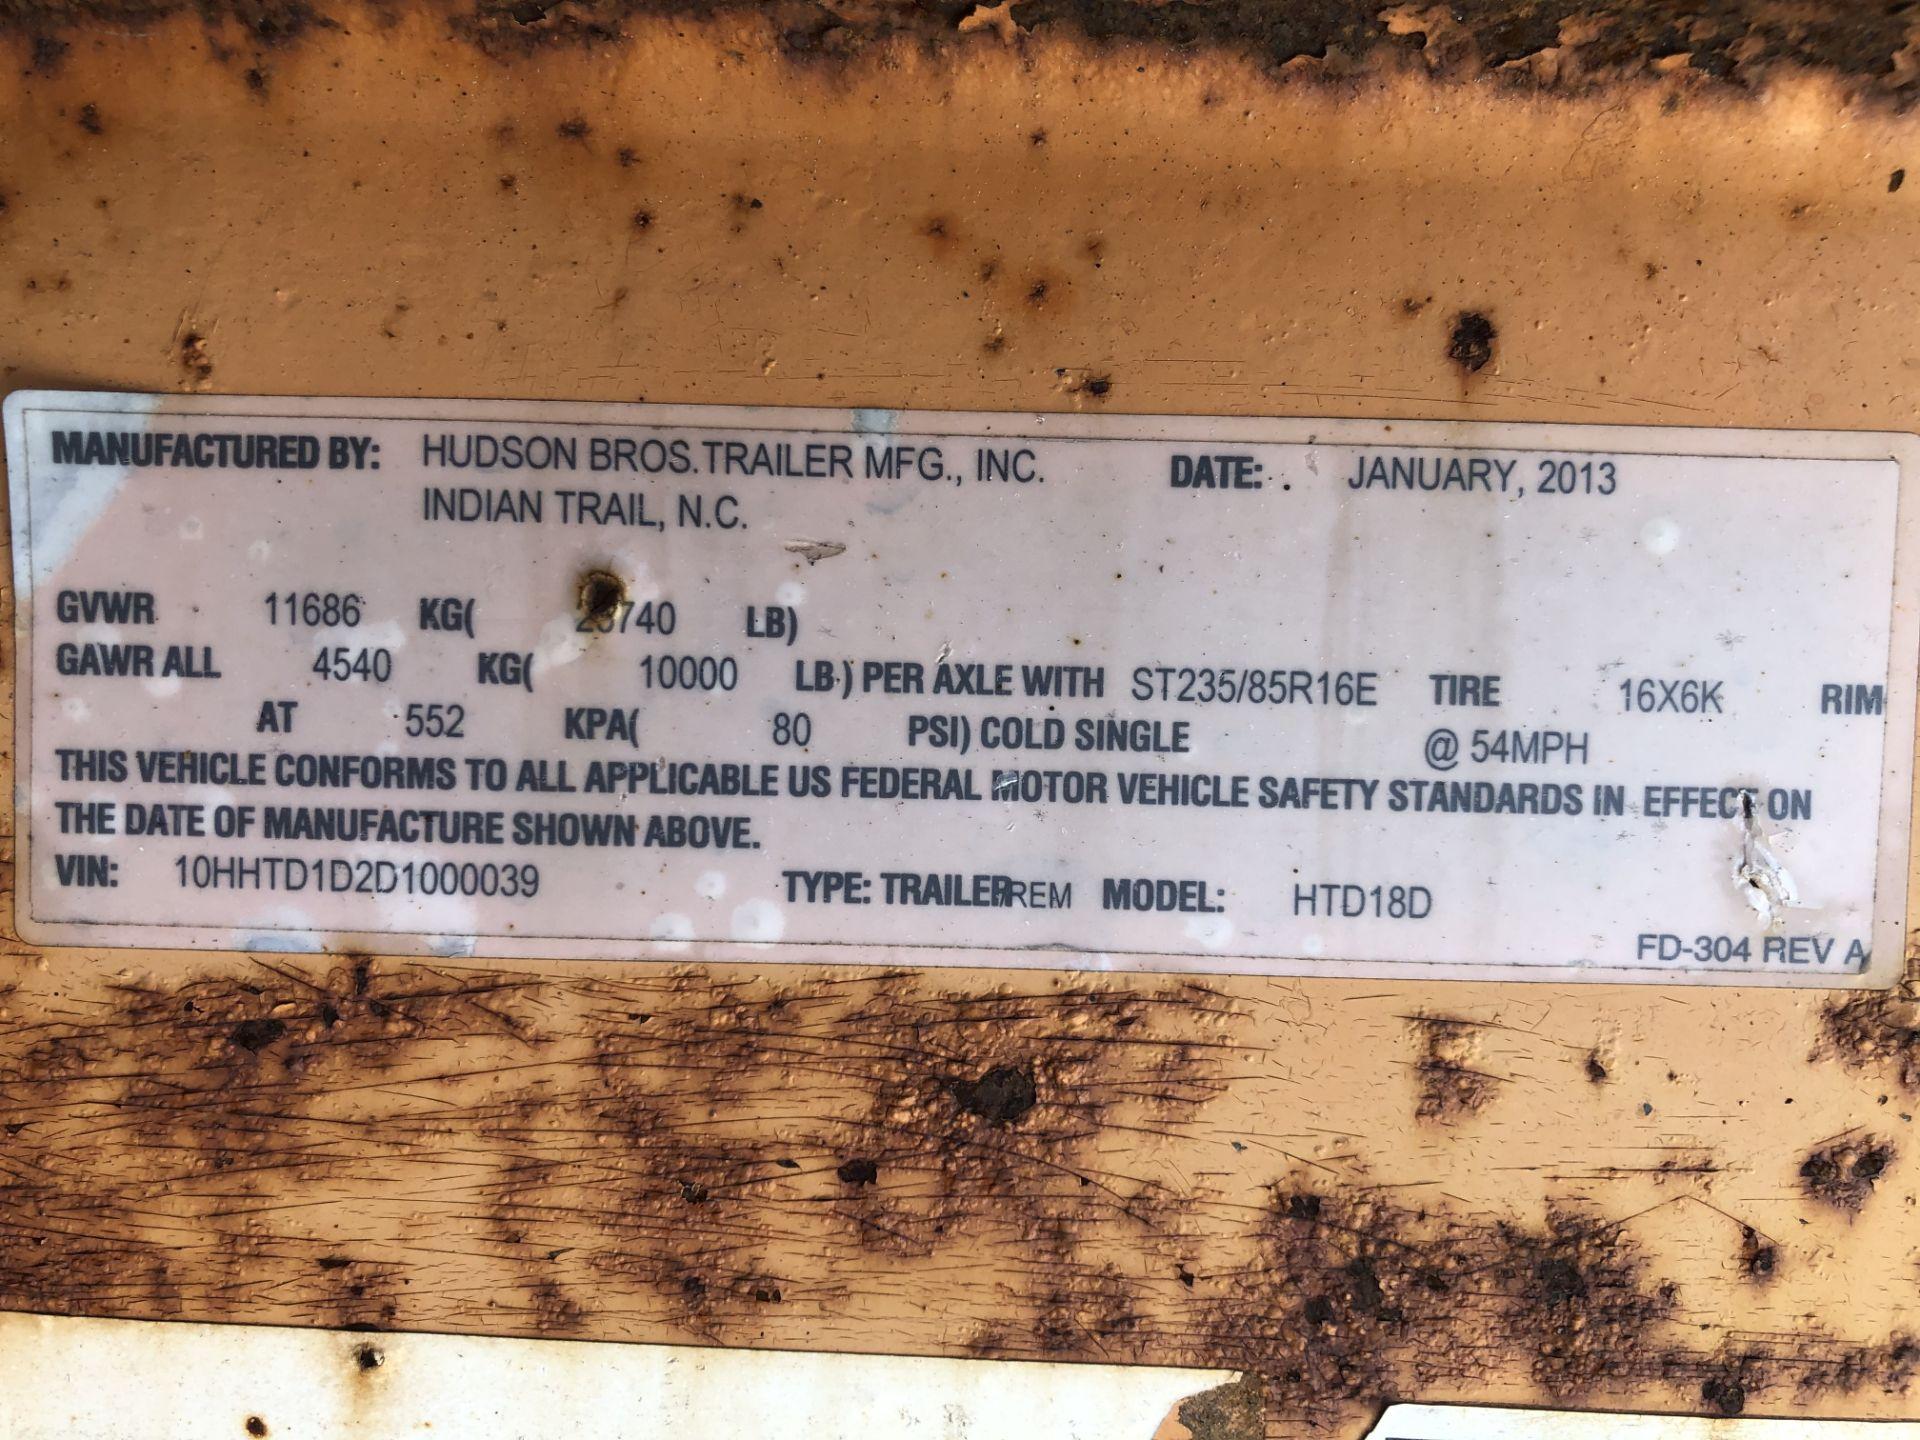 Lot 32 - 2013 Hudson Bros Trailer HTD18D 10 Ton